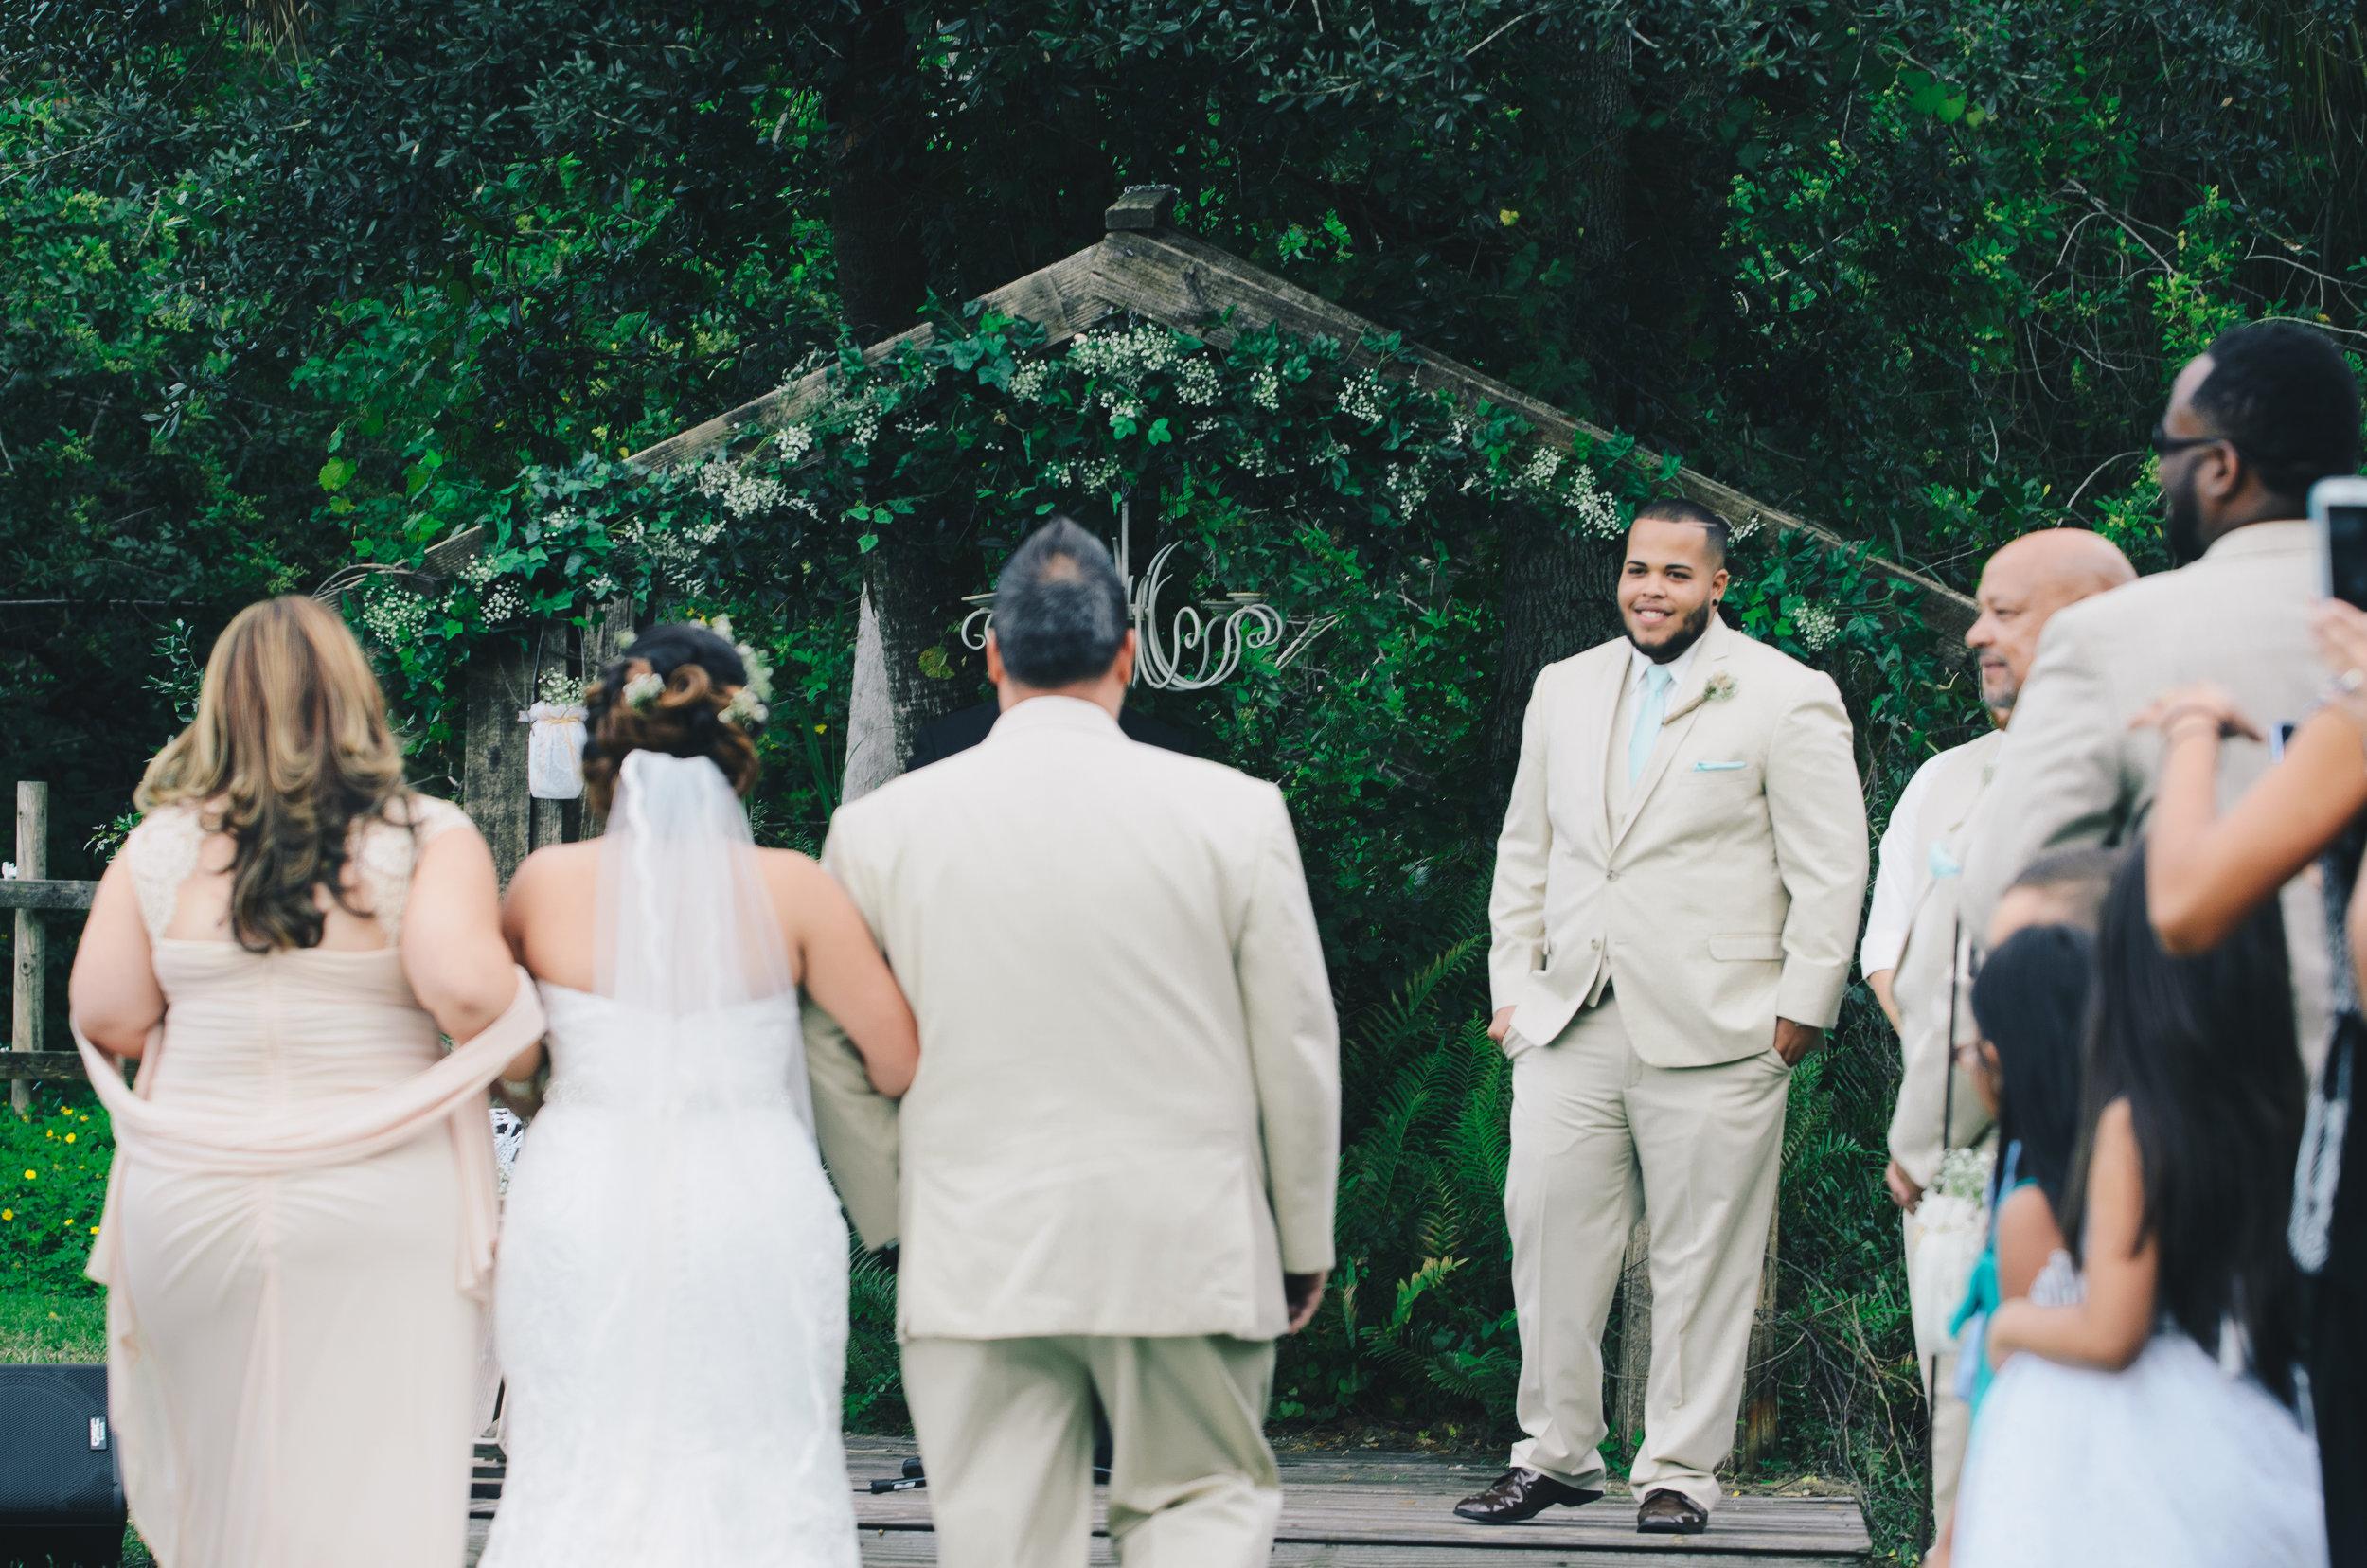 central-fl-christian-wedding-day-11.jpg